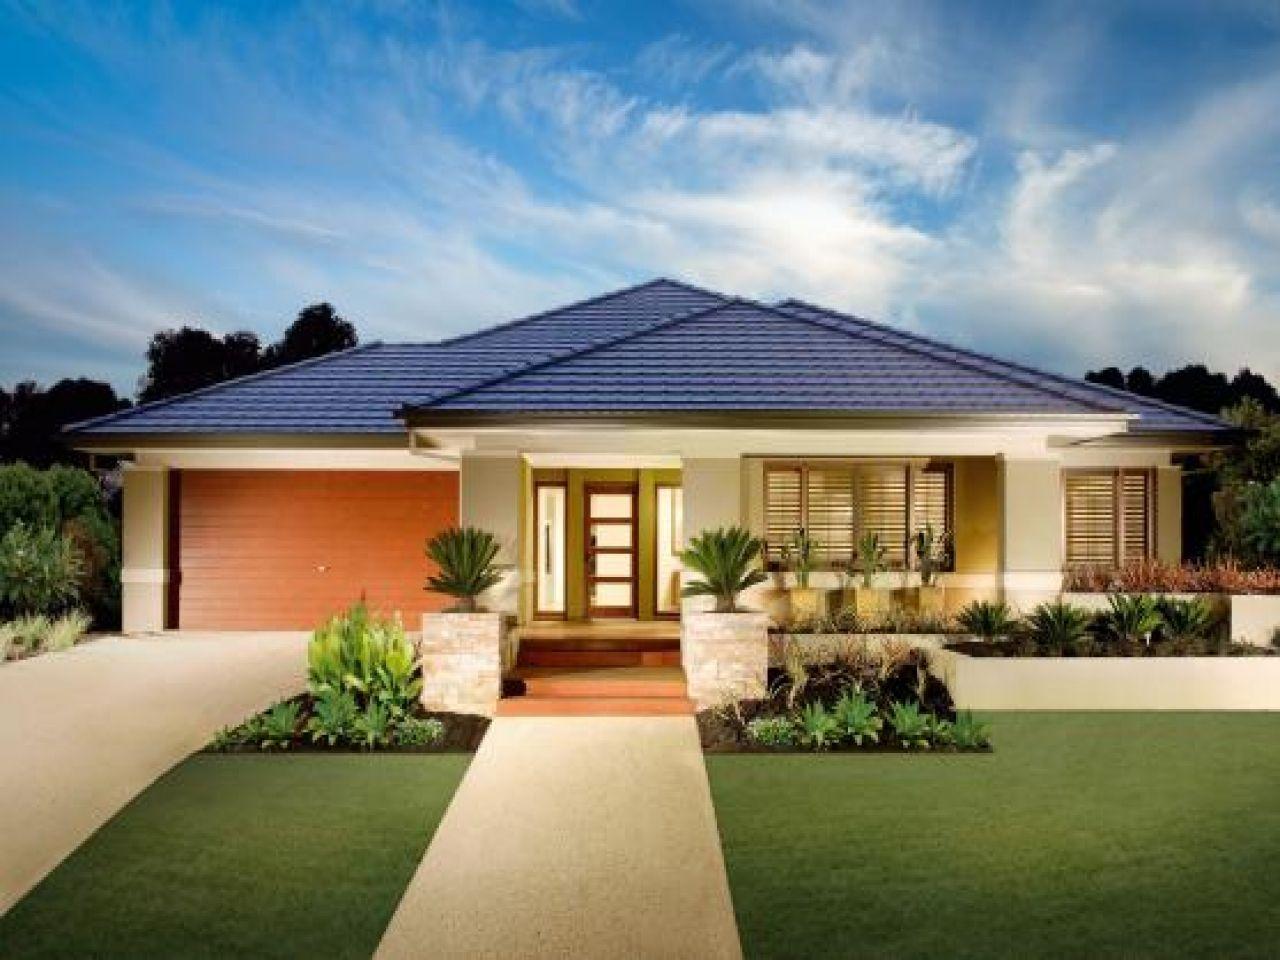 Image of Nice Single Story Modern House Plans